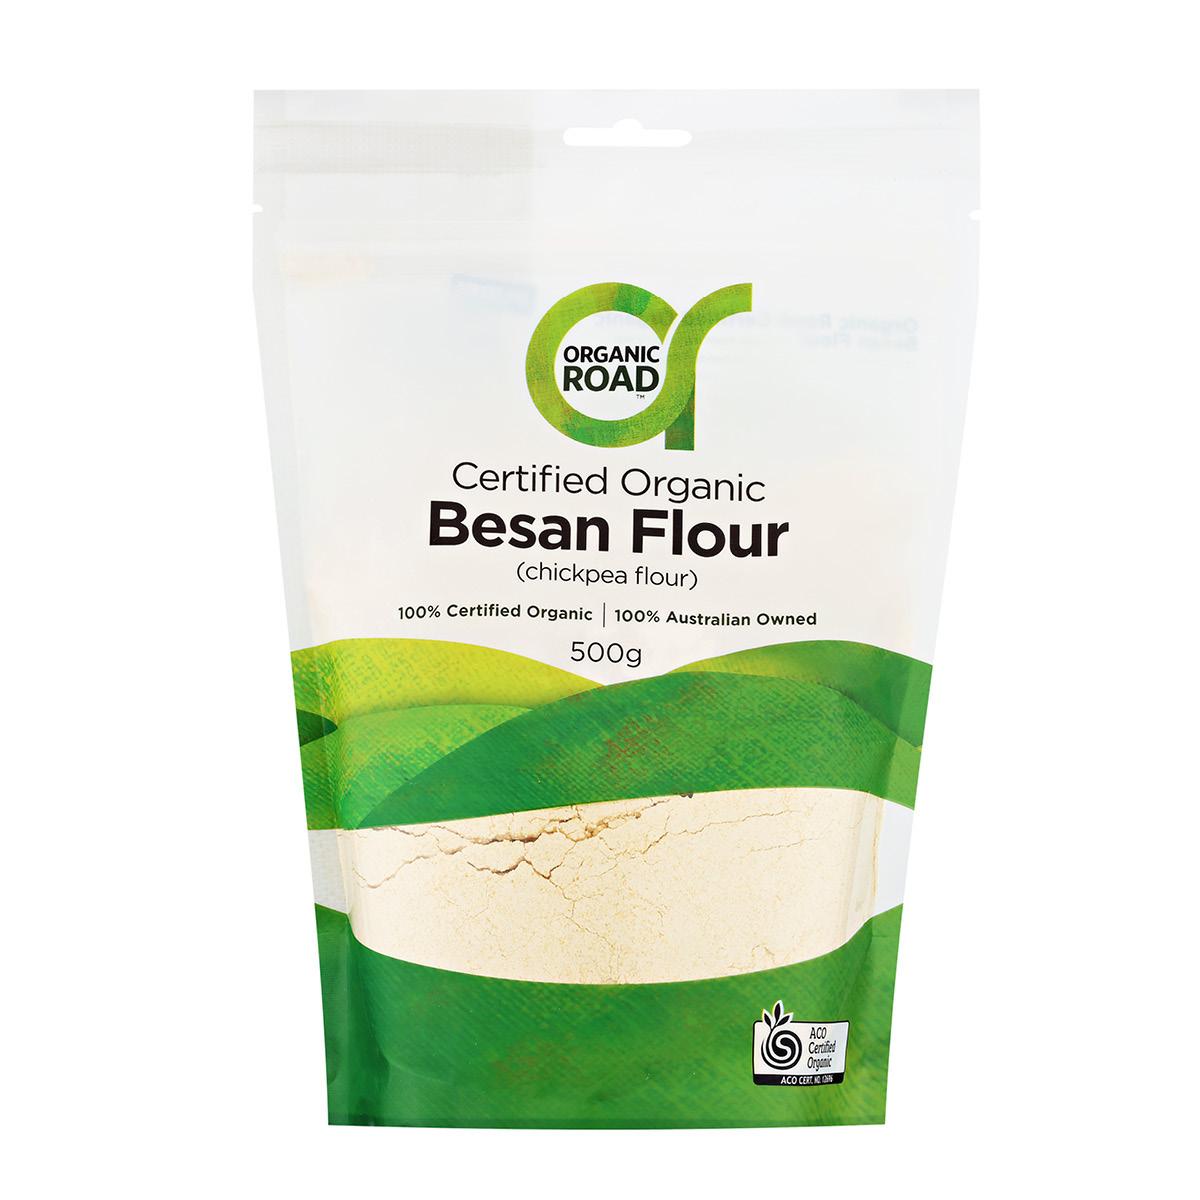 Organic Road Certified Organic Besan Flour (Chickpea Flour)